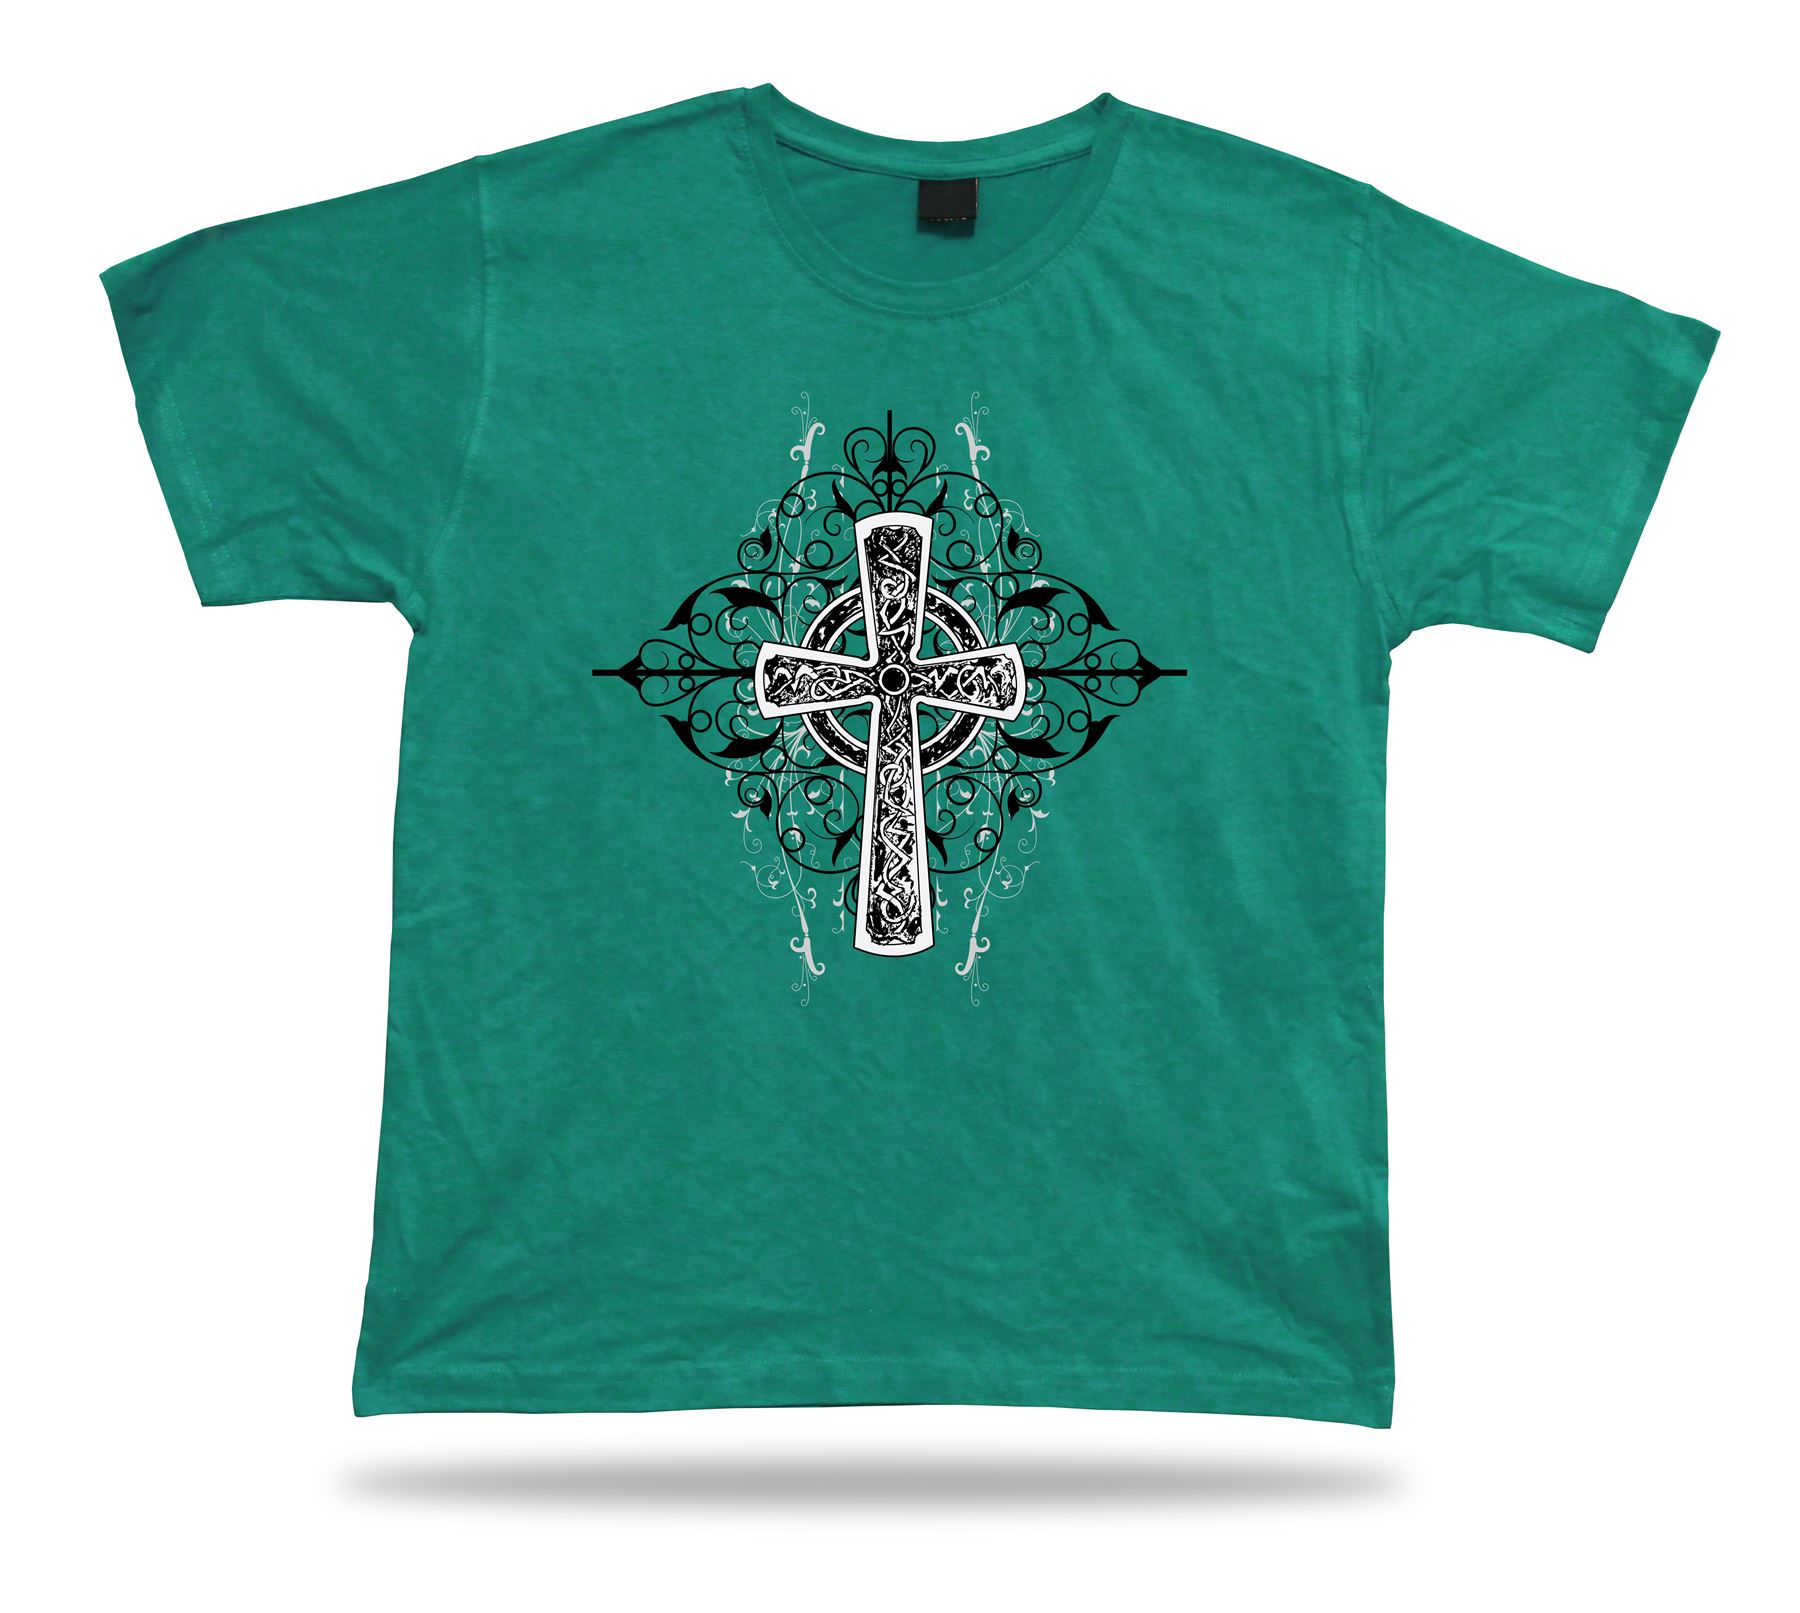 Dude The Big Lebowski Men Women Unisex T Shirt T-shirt Vest Baseball Hoodie 2631